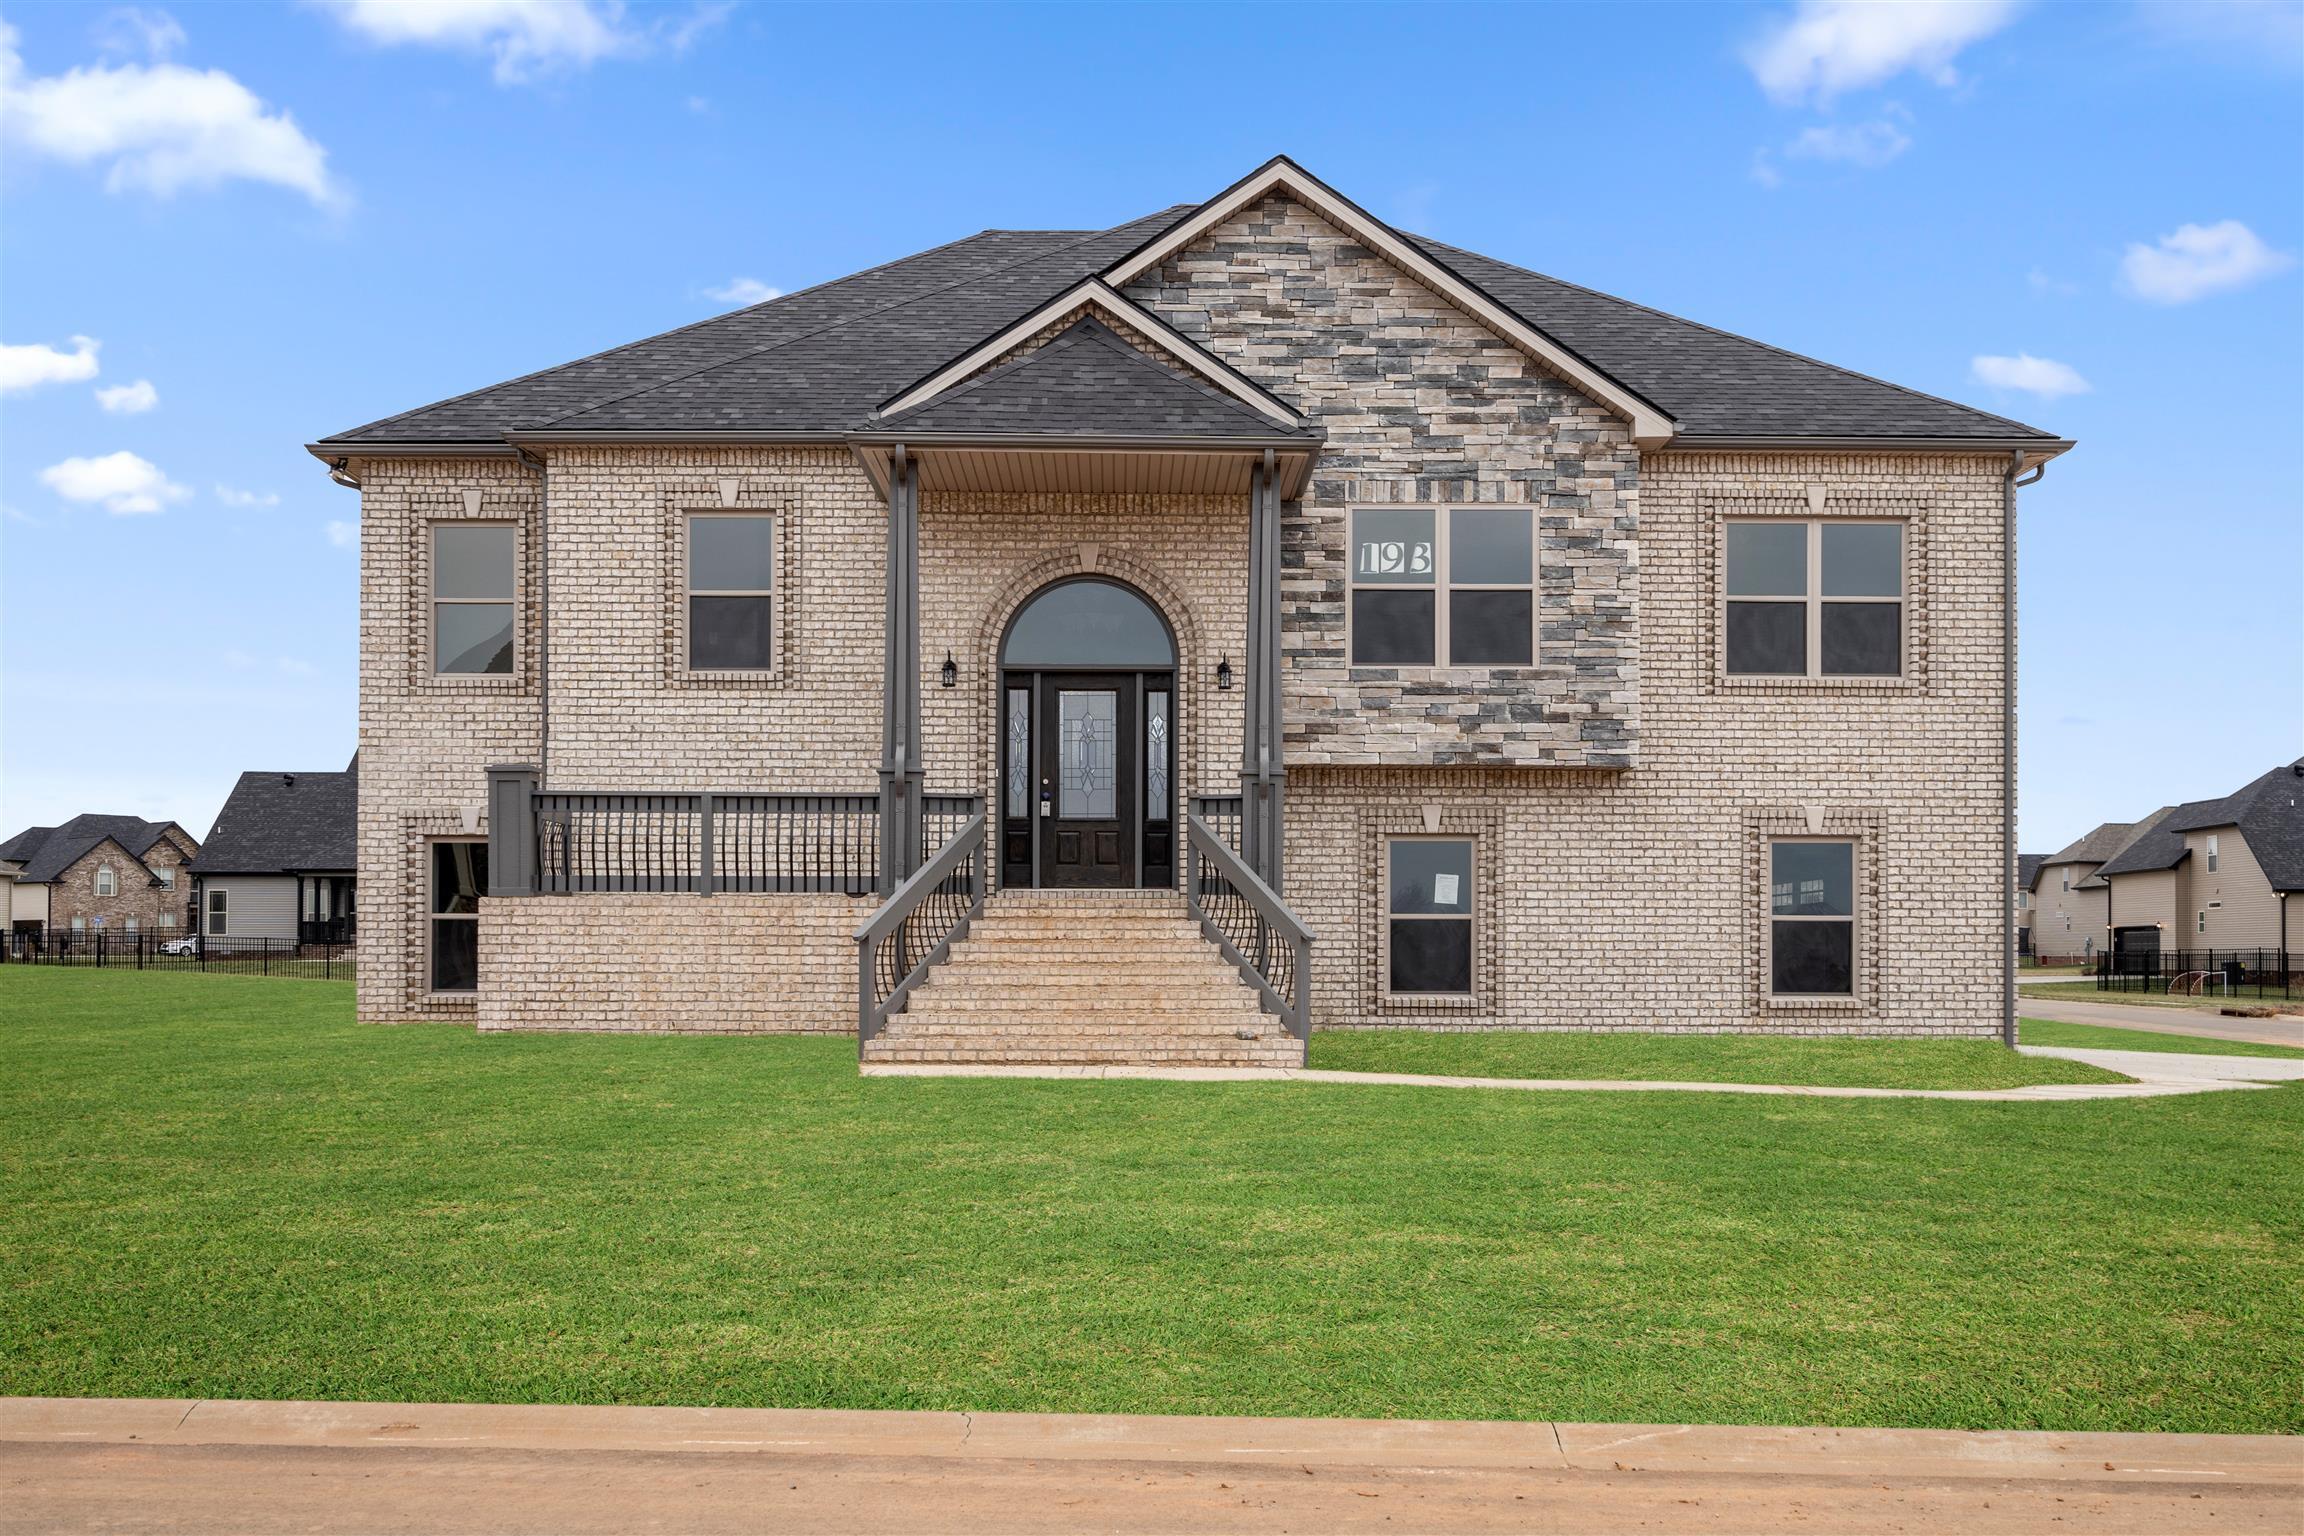 629 Farmington Lot 629 , Clarksville, TN 37043 - Clarksville, TN real estate listing